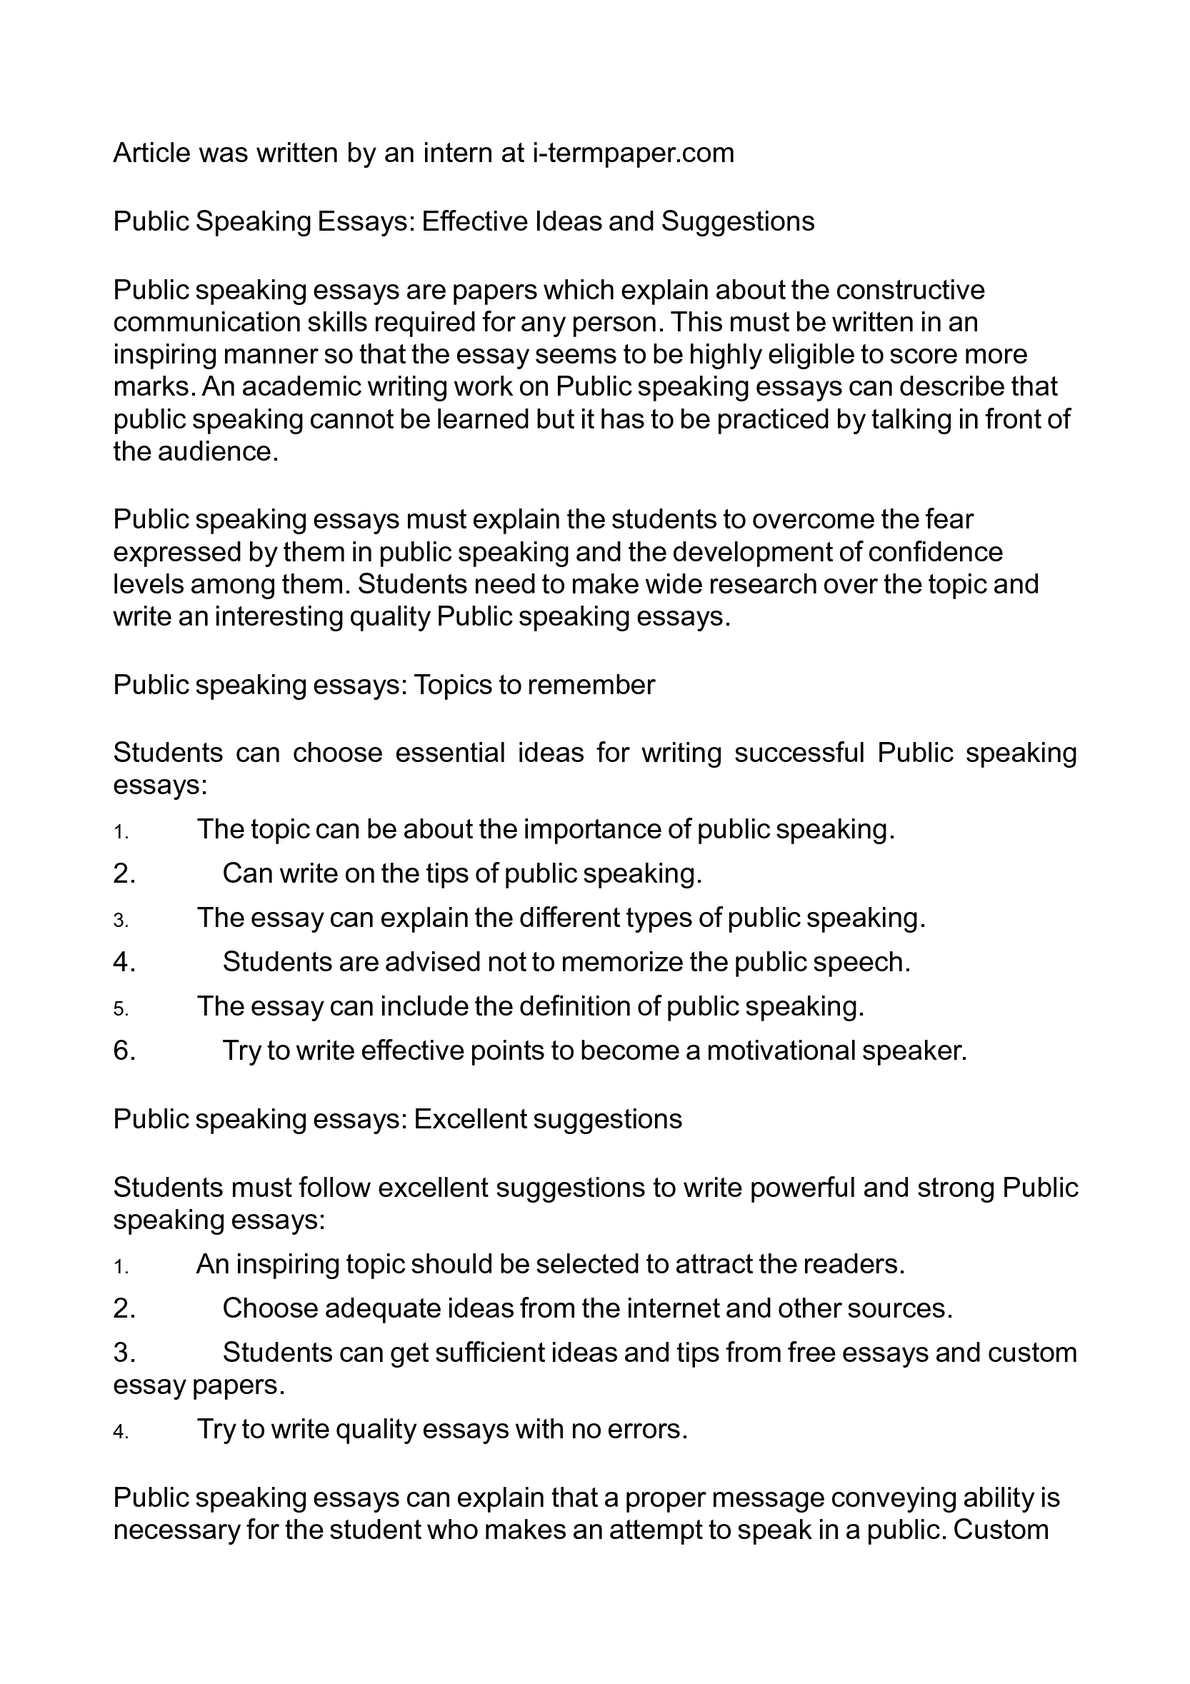 001 Public Speaking Essay P1 Stunning Topics Example Introduction Full